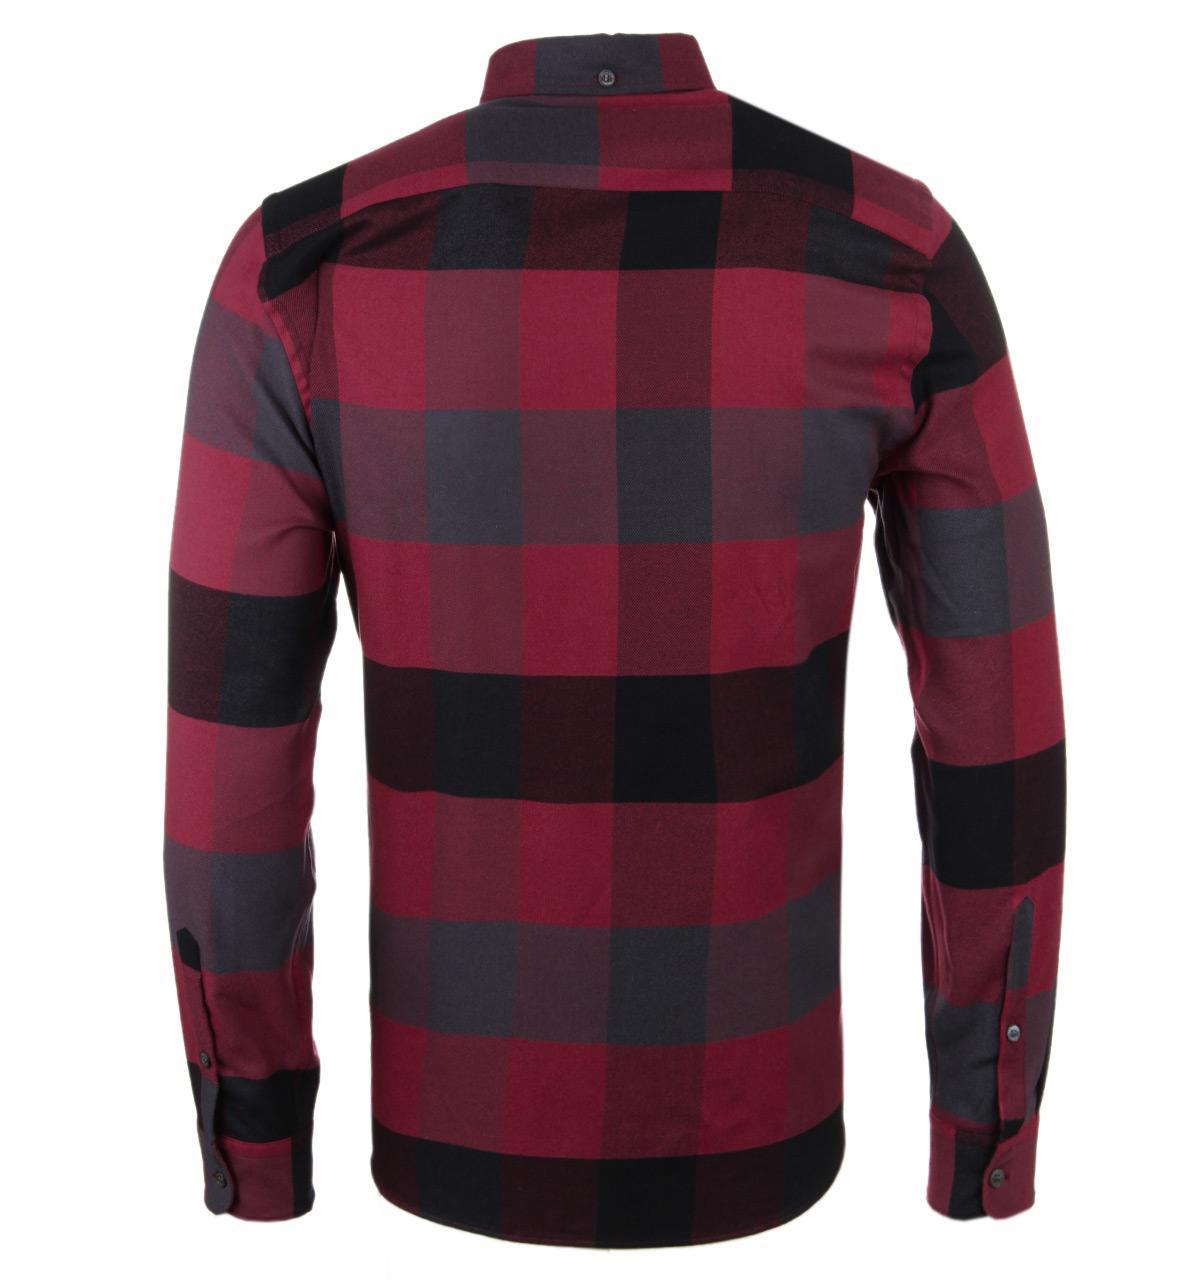 Aquascutum Rigby Red Mega Check Flannel Shirt for Men